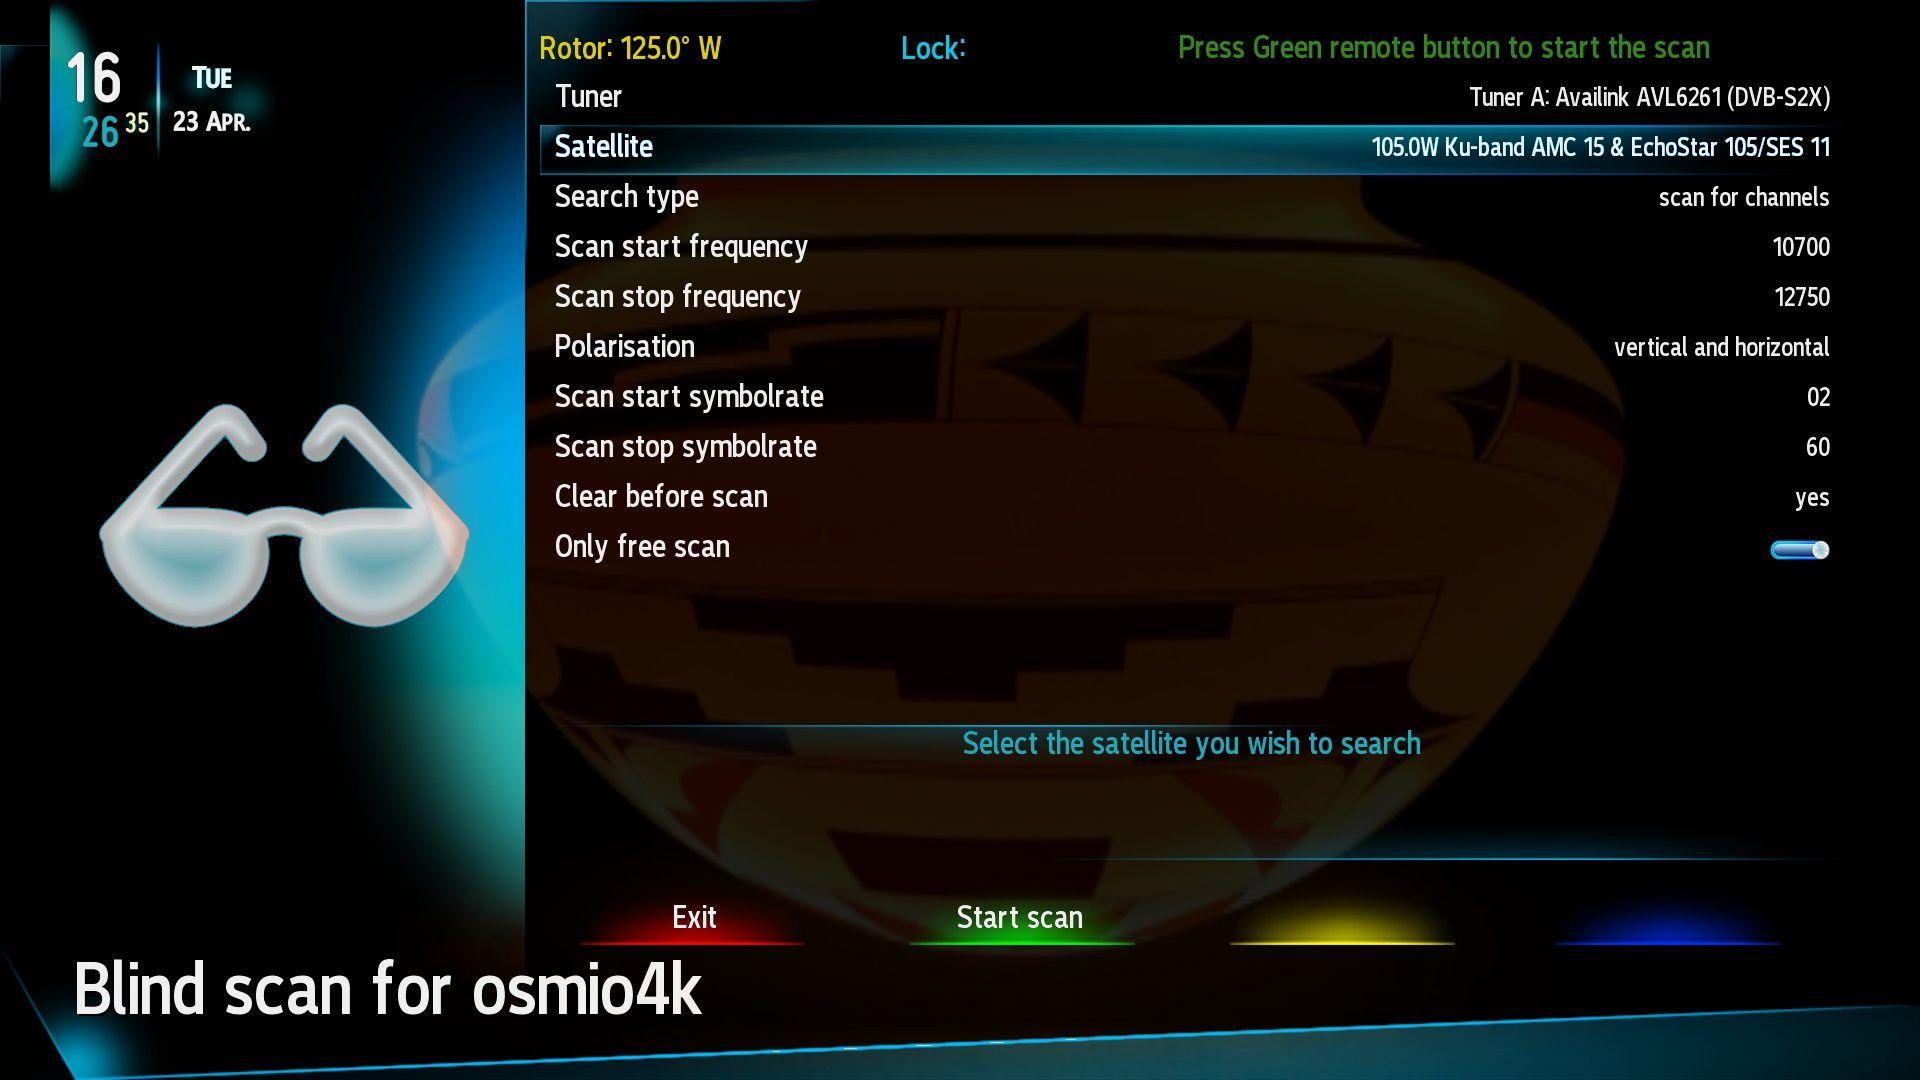 Edision - OS mio 4k - motor setup for blind scan